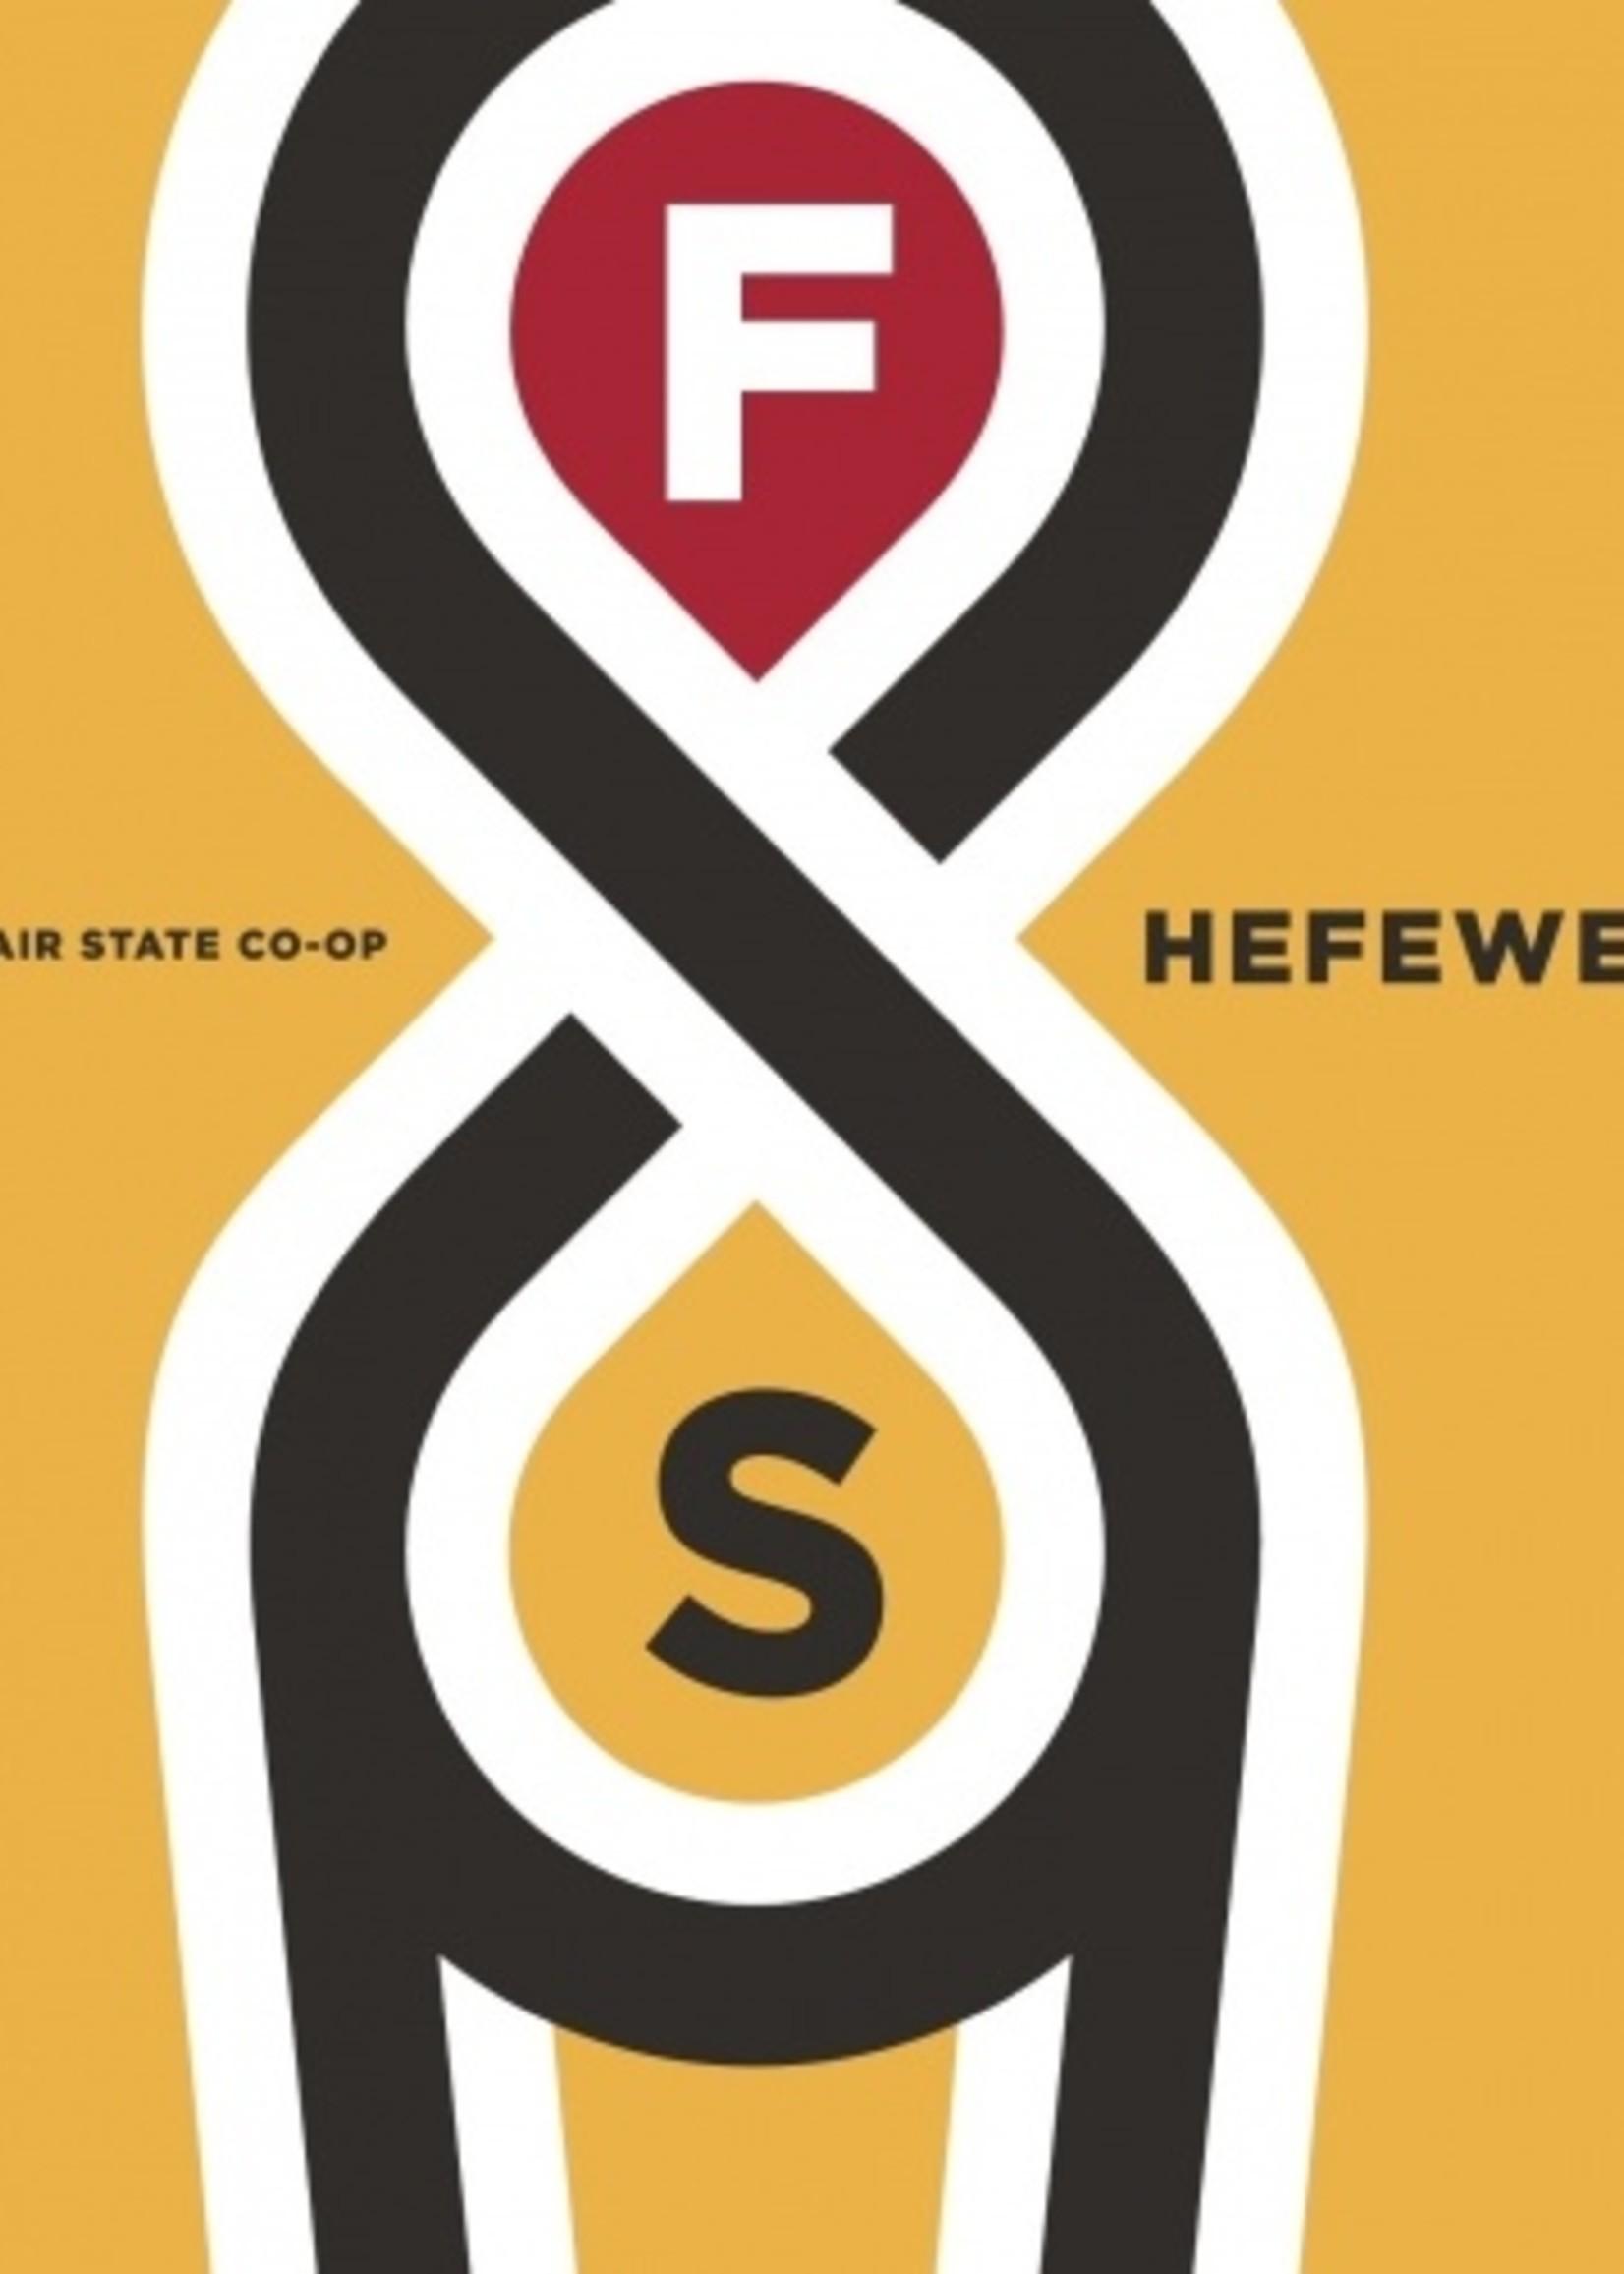 Fair State Hefeweizen - 4x16oz Cans